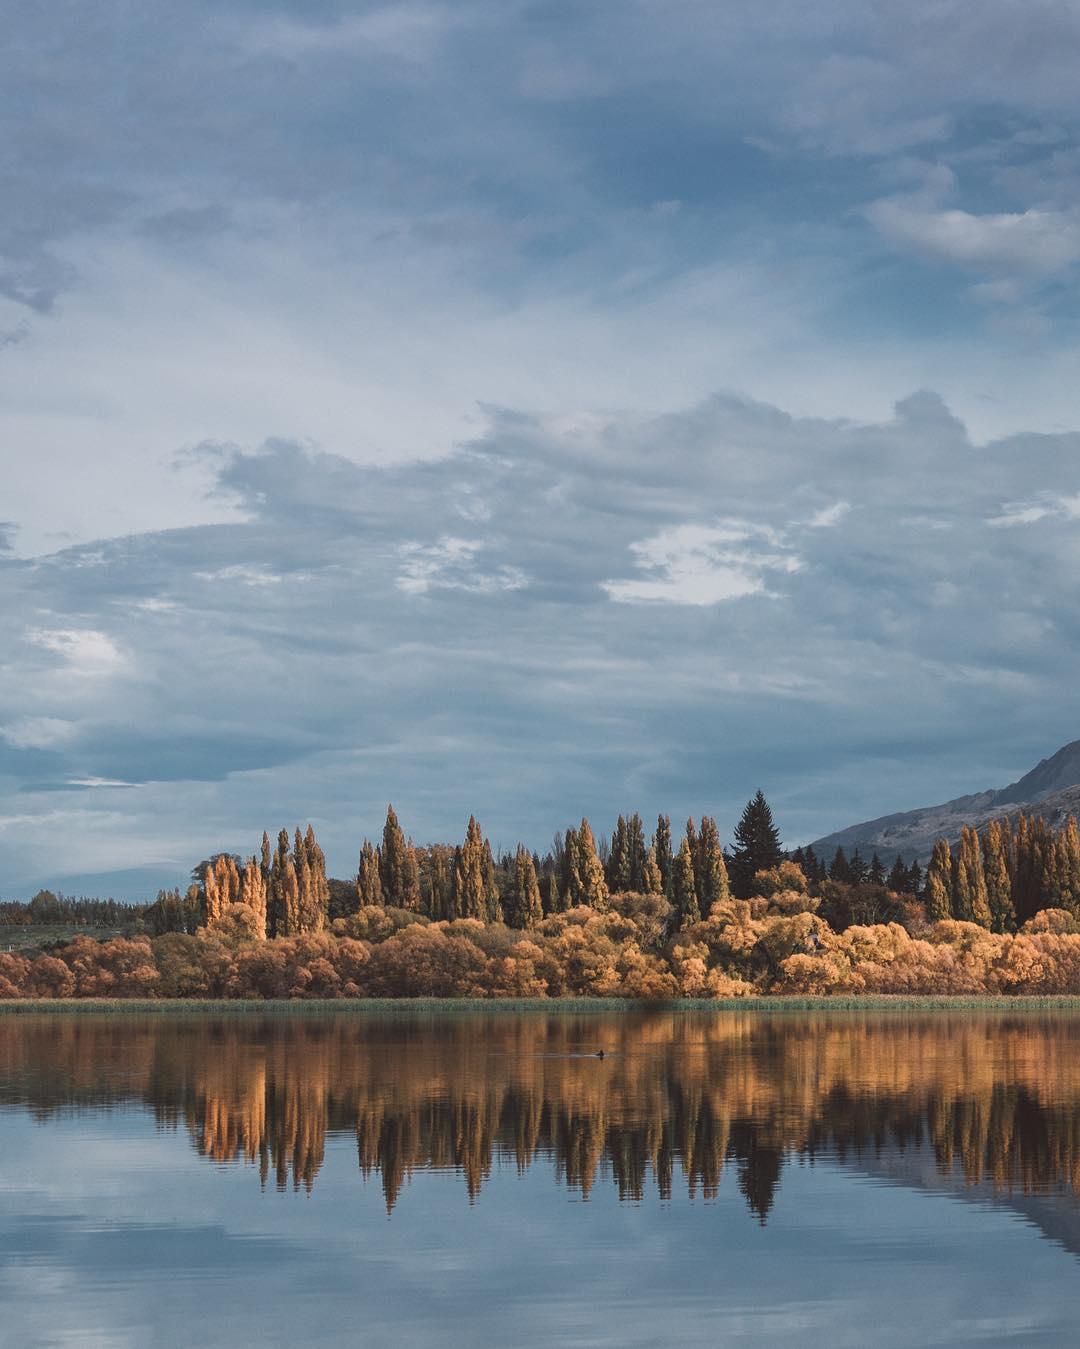 Природа и путешествия на снимках Кармен Хутер